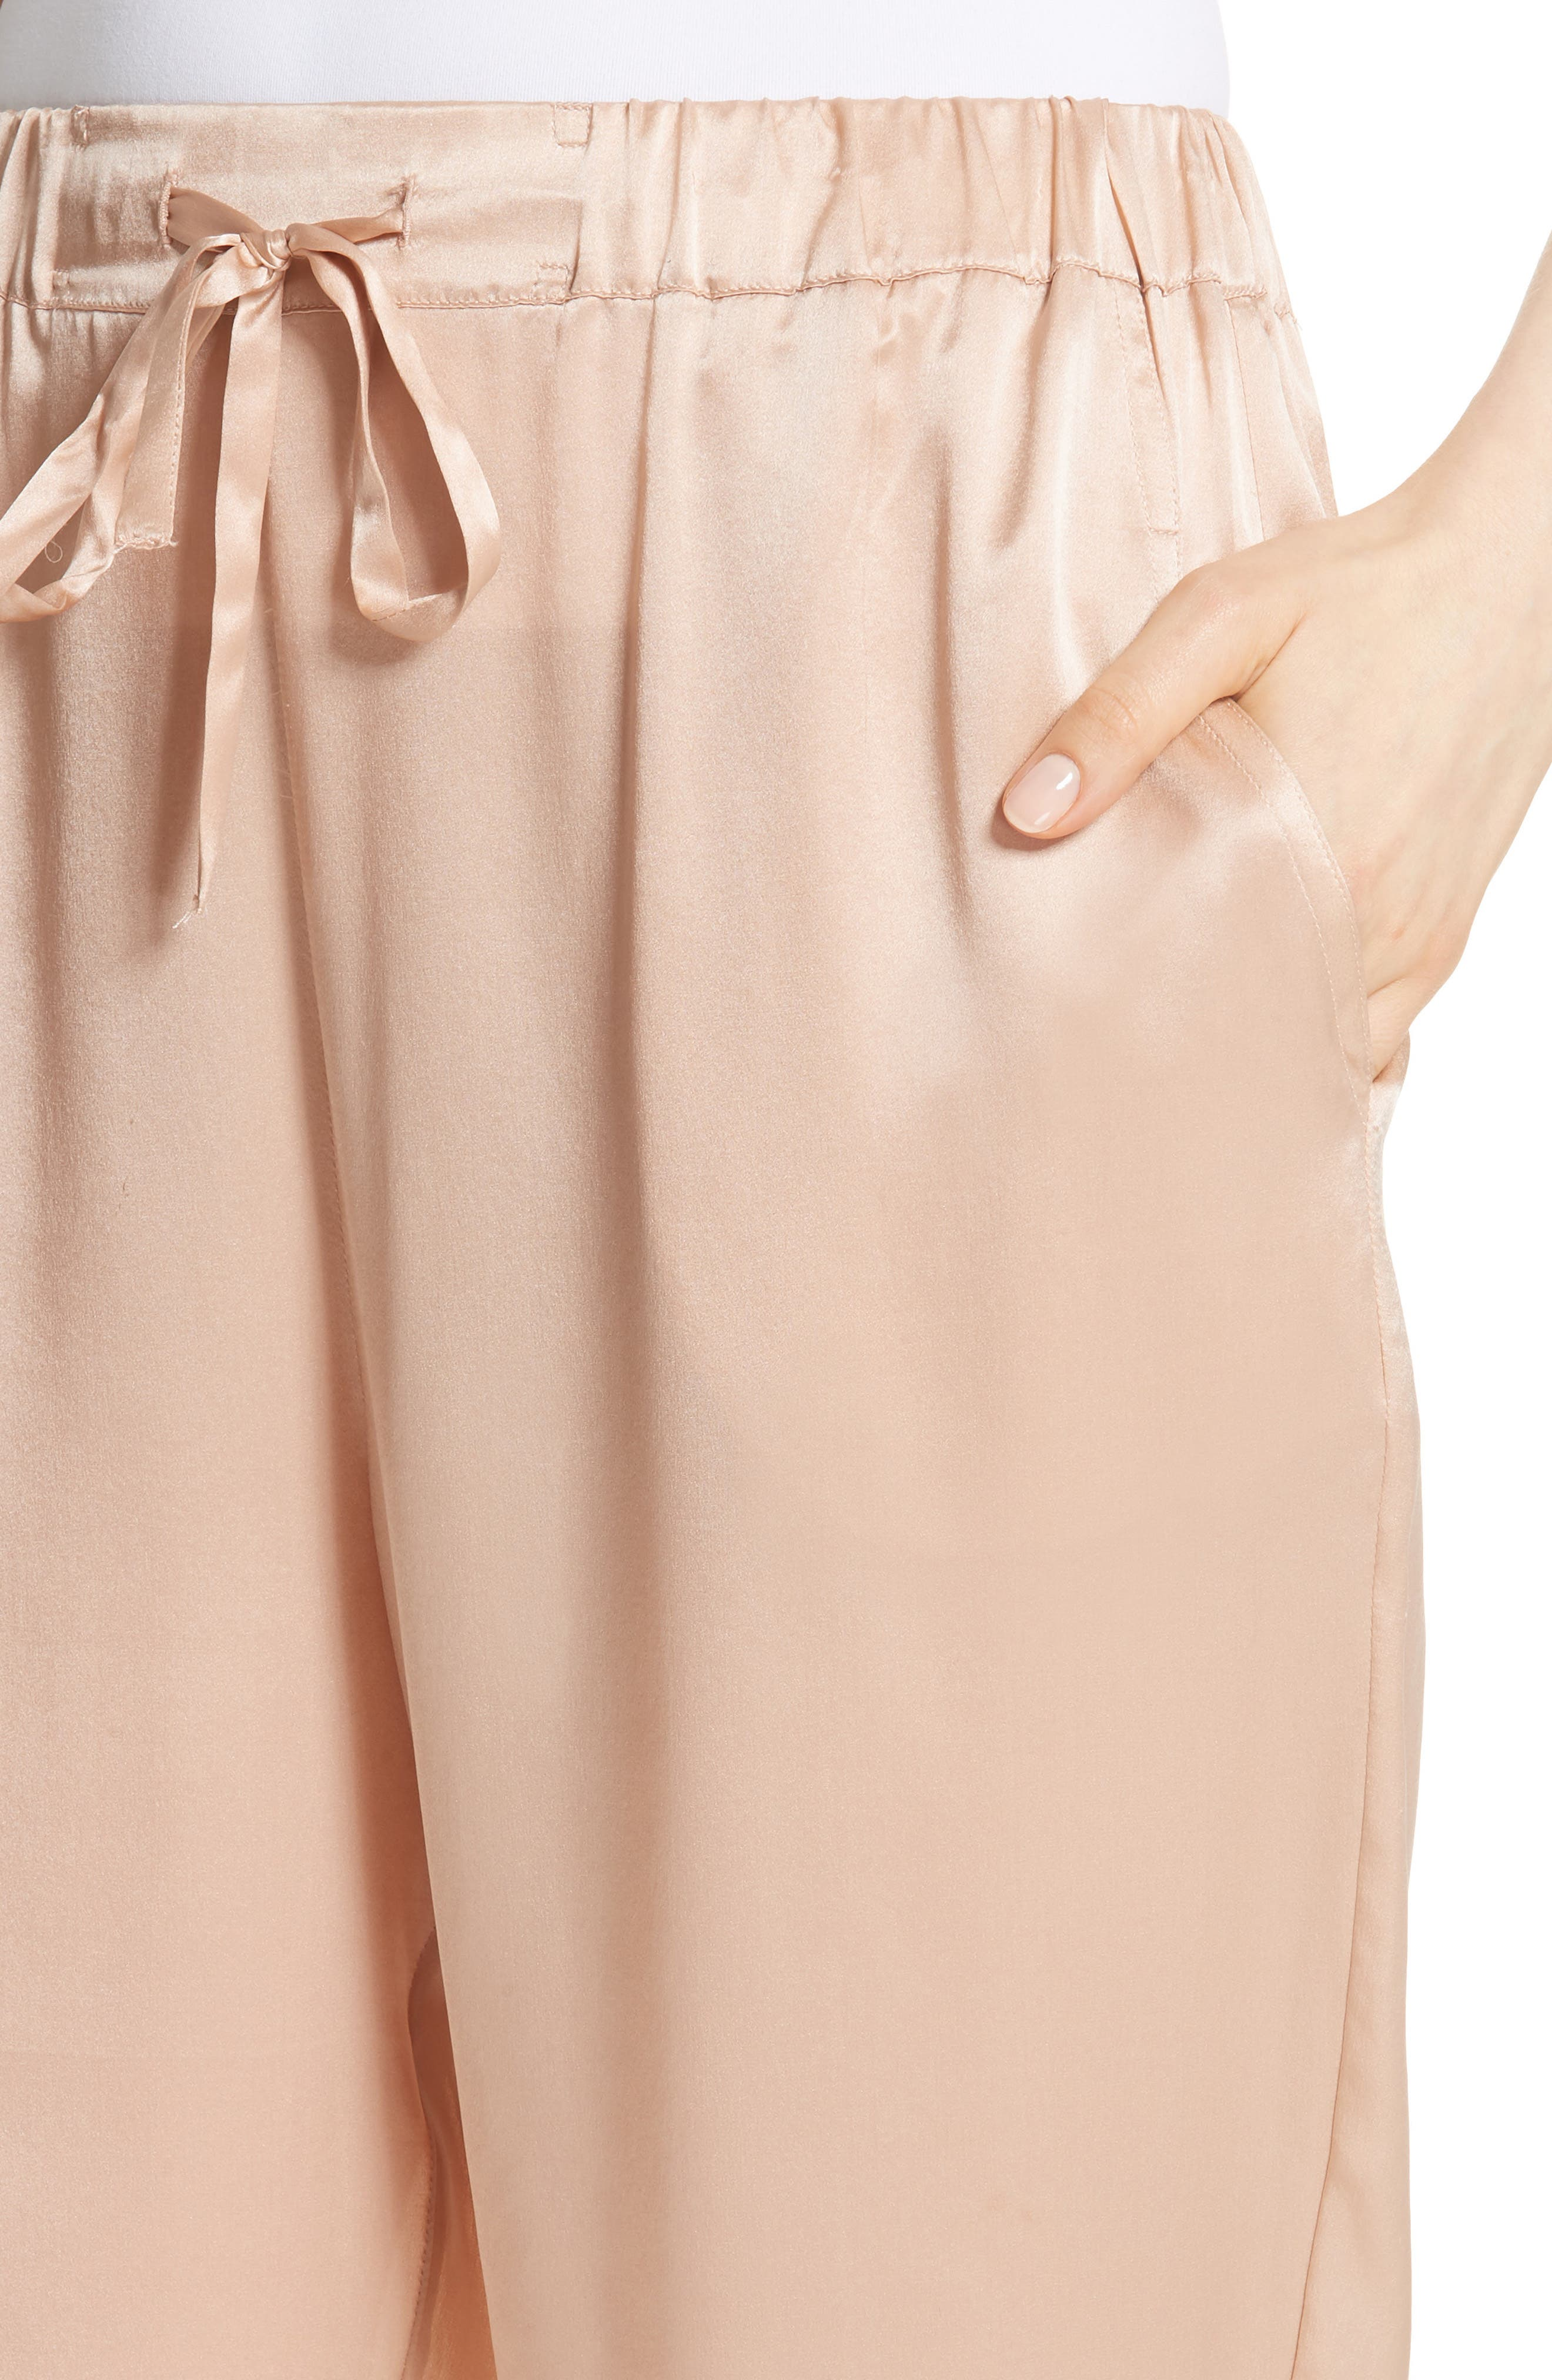 Fester Silk Ankle Pants,                             Alternate thumbnail 4, color,                             250